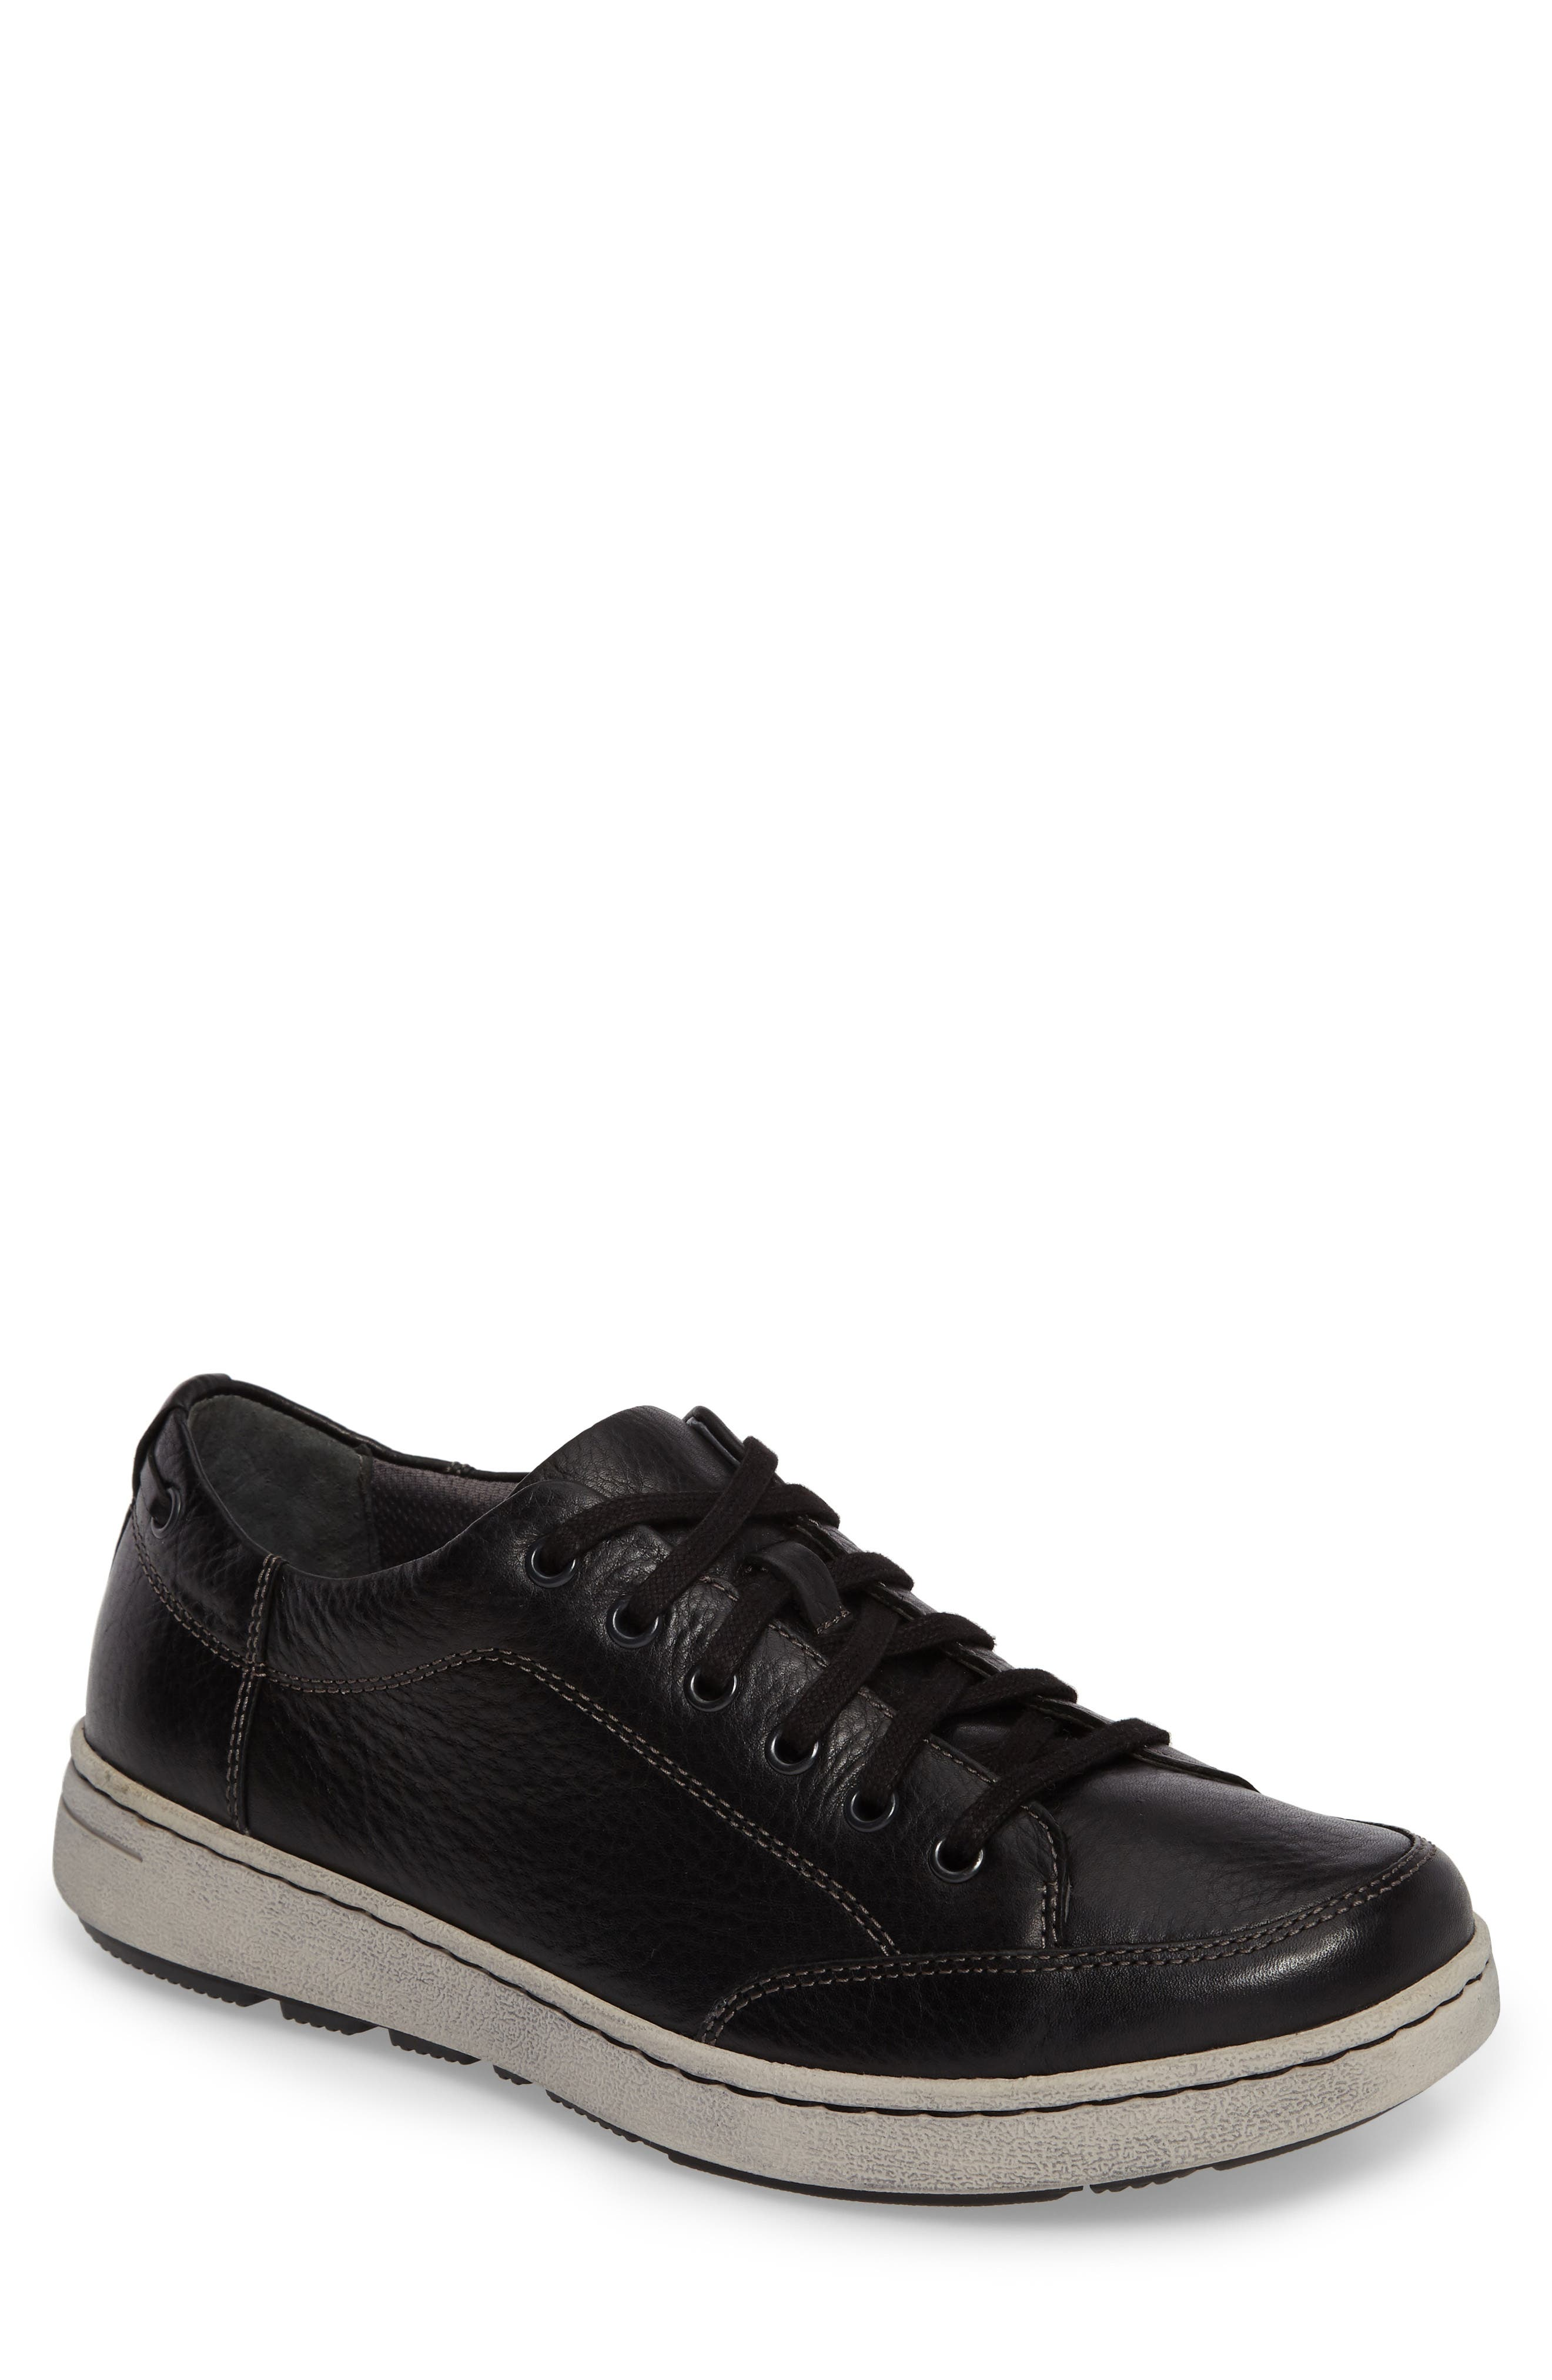 Dansko 'Vaughn' Water-Resistant Sneaker (Men)